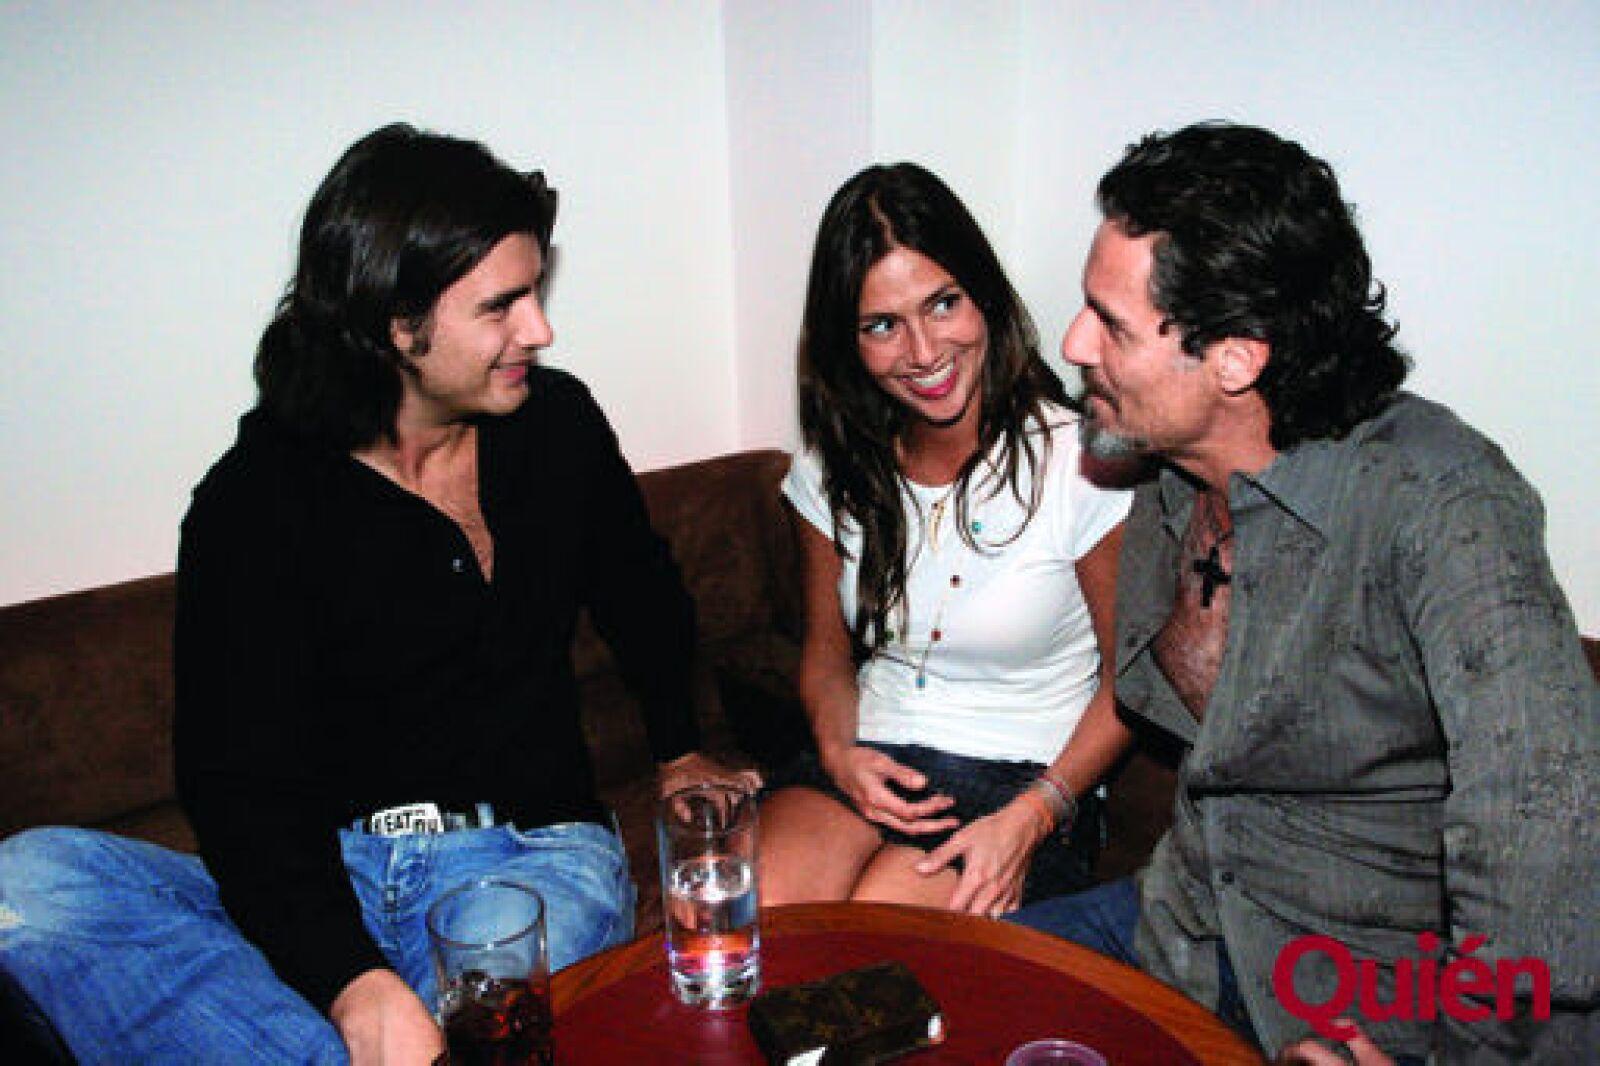 Carlos Anda, Mariana Alaman, Carlos Bisdikián